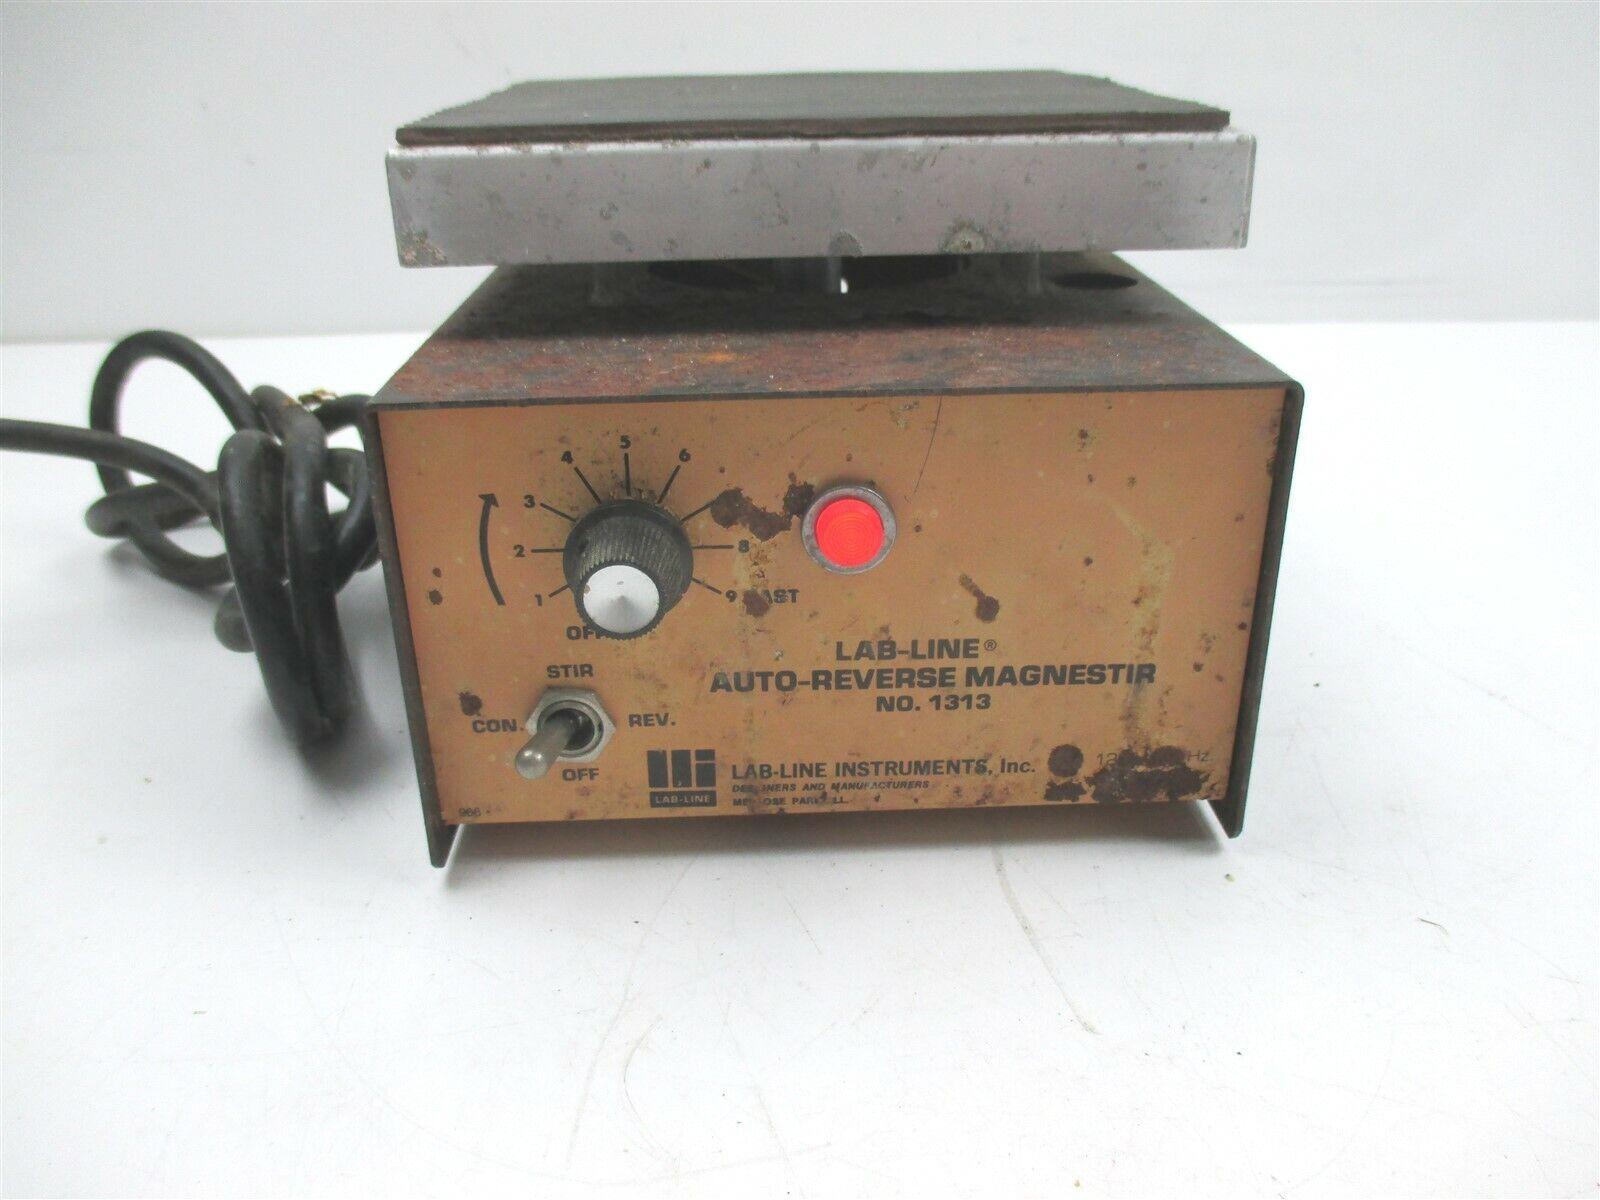 Lab-Line 1313 Auto-Reverse Magnestir Magnetic Laboratory Mixer Stirrer Device